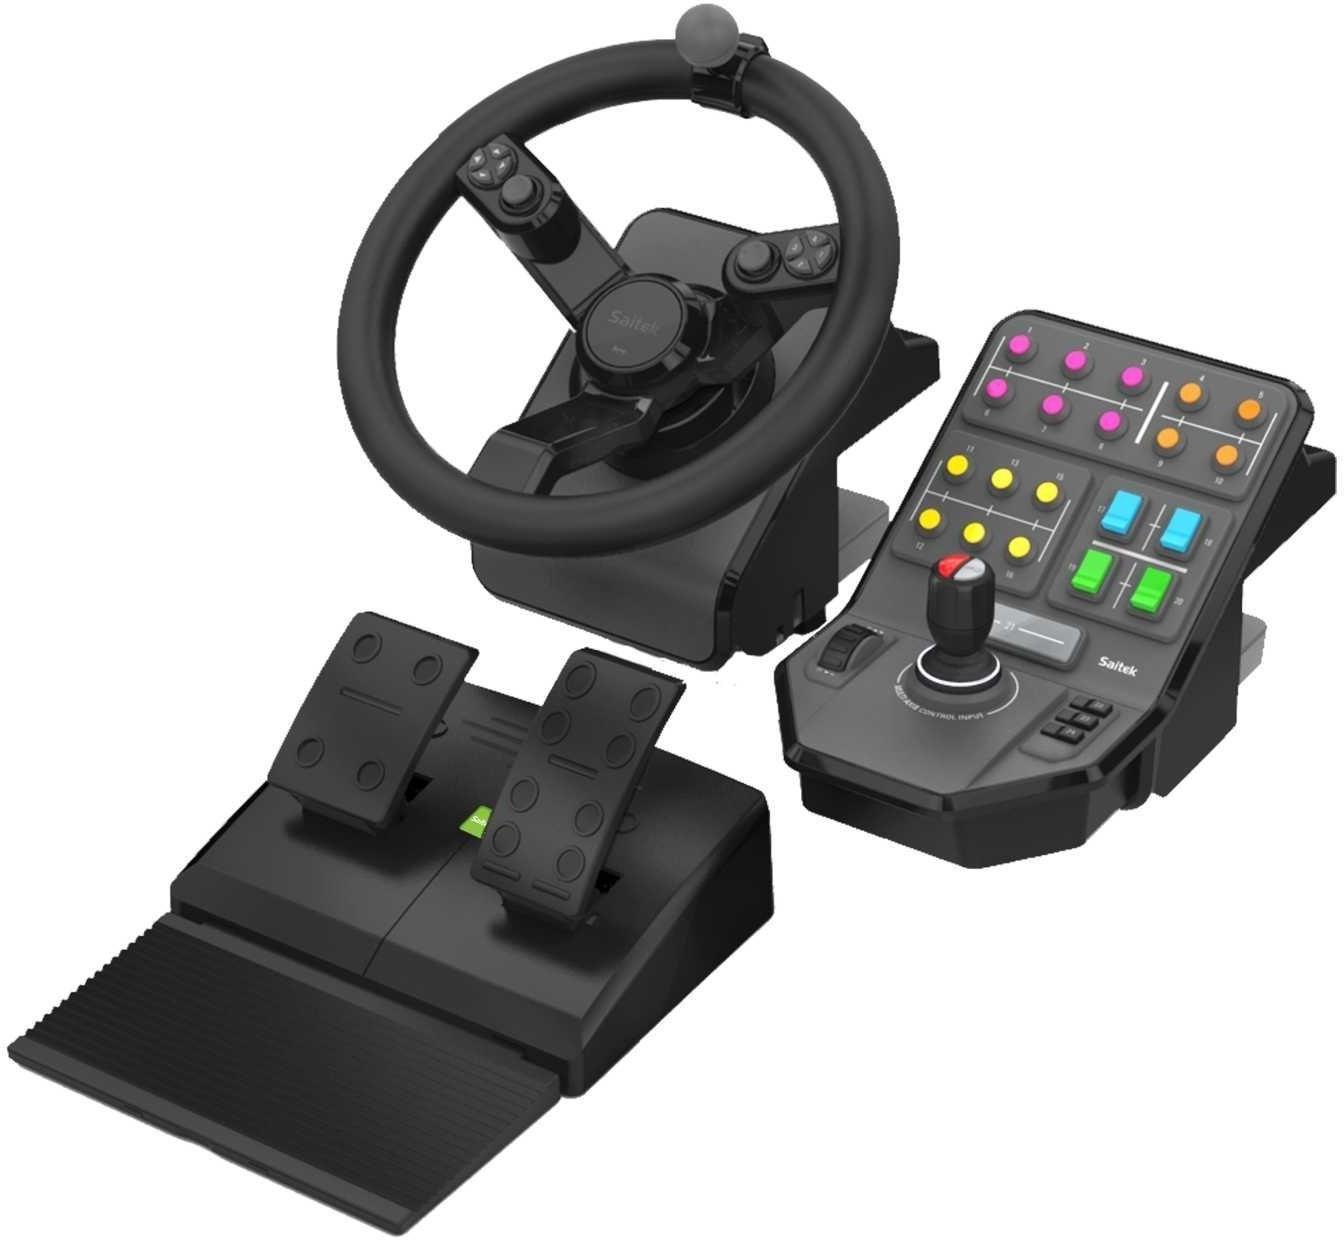 Gaming-Zubehör: z.B. Logitech G Farming Simulator Controller Bundle - 139€   Logitech G502 Proteus Spectrum Maus - 37€   Z333 Boxen - 29€